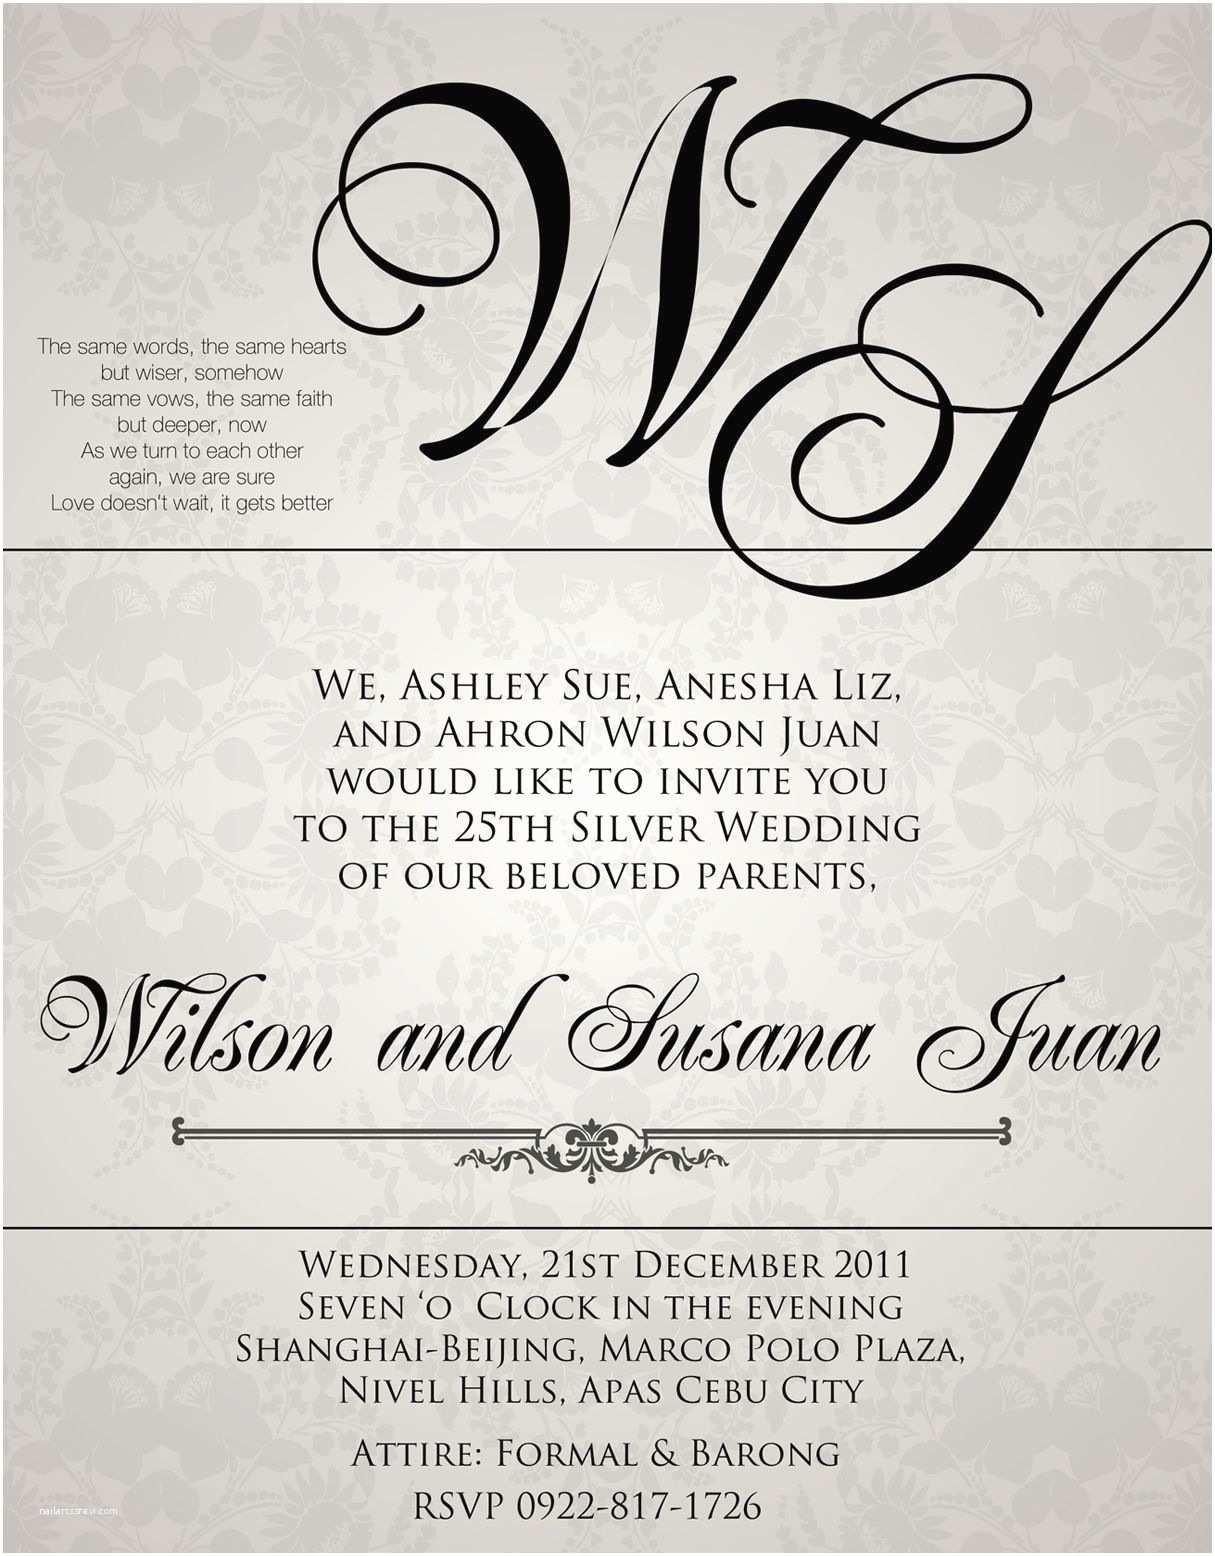 Sample Wedding Invitations Sample Wedding Invitation Wording In the Philippines